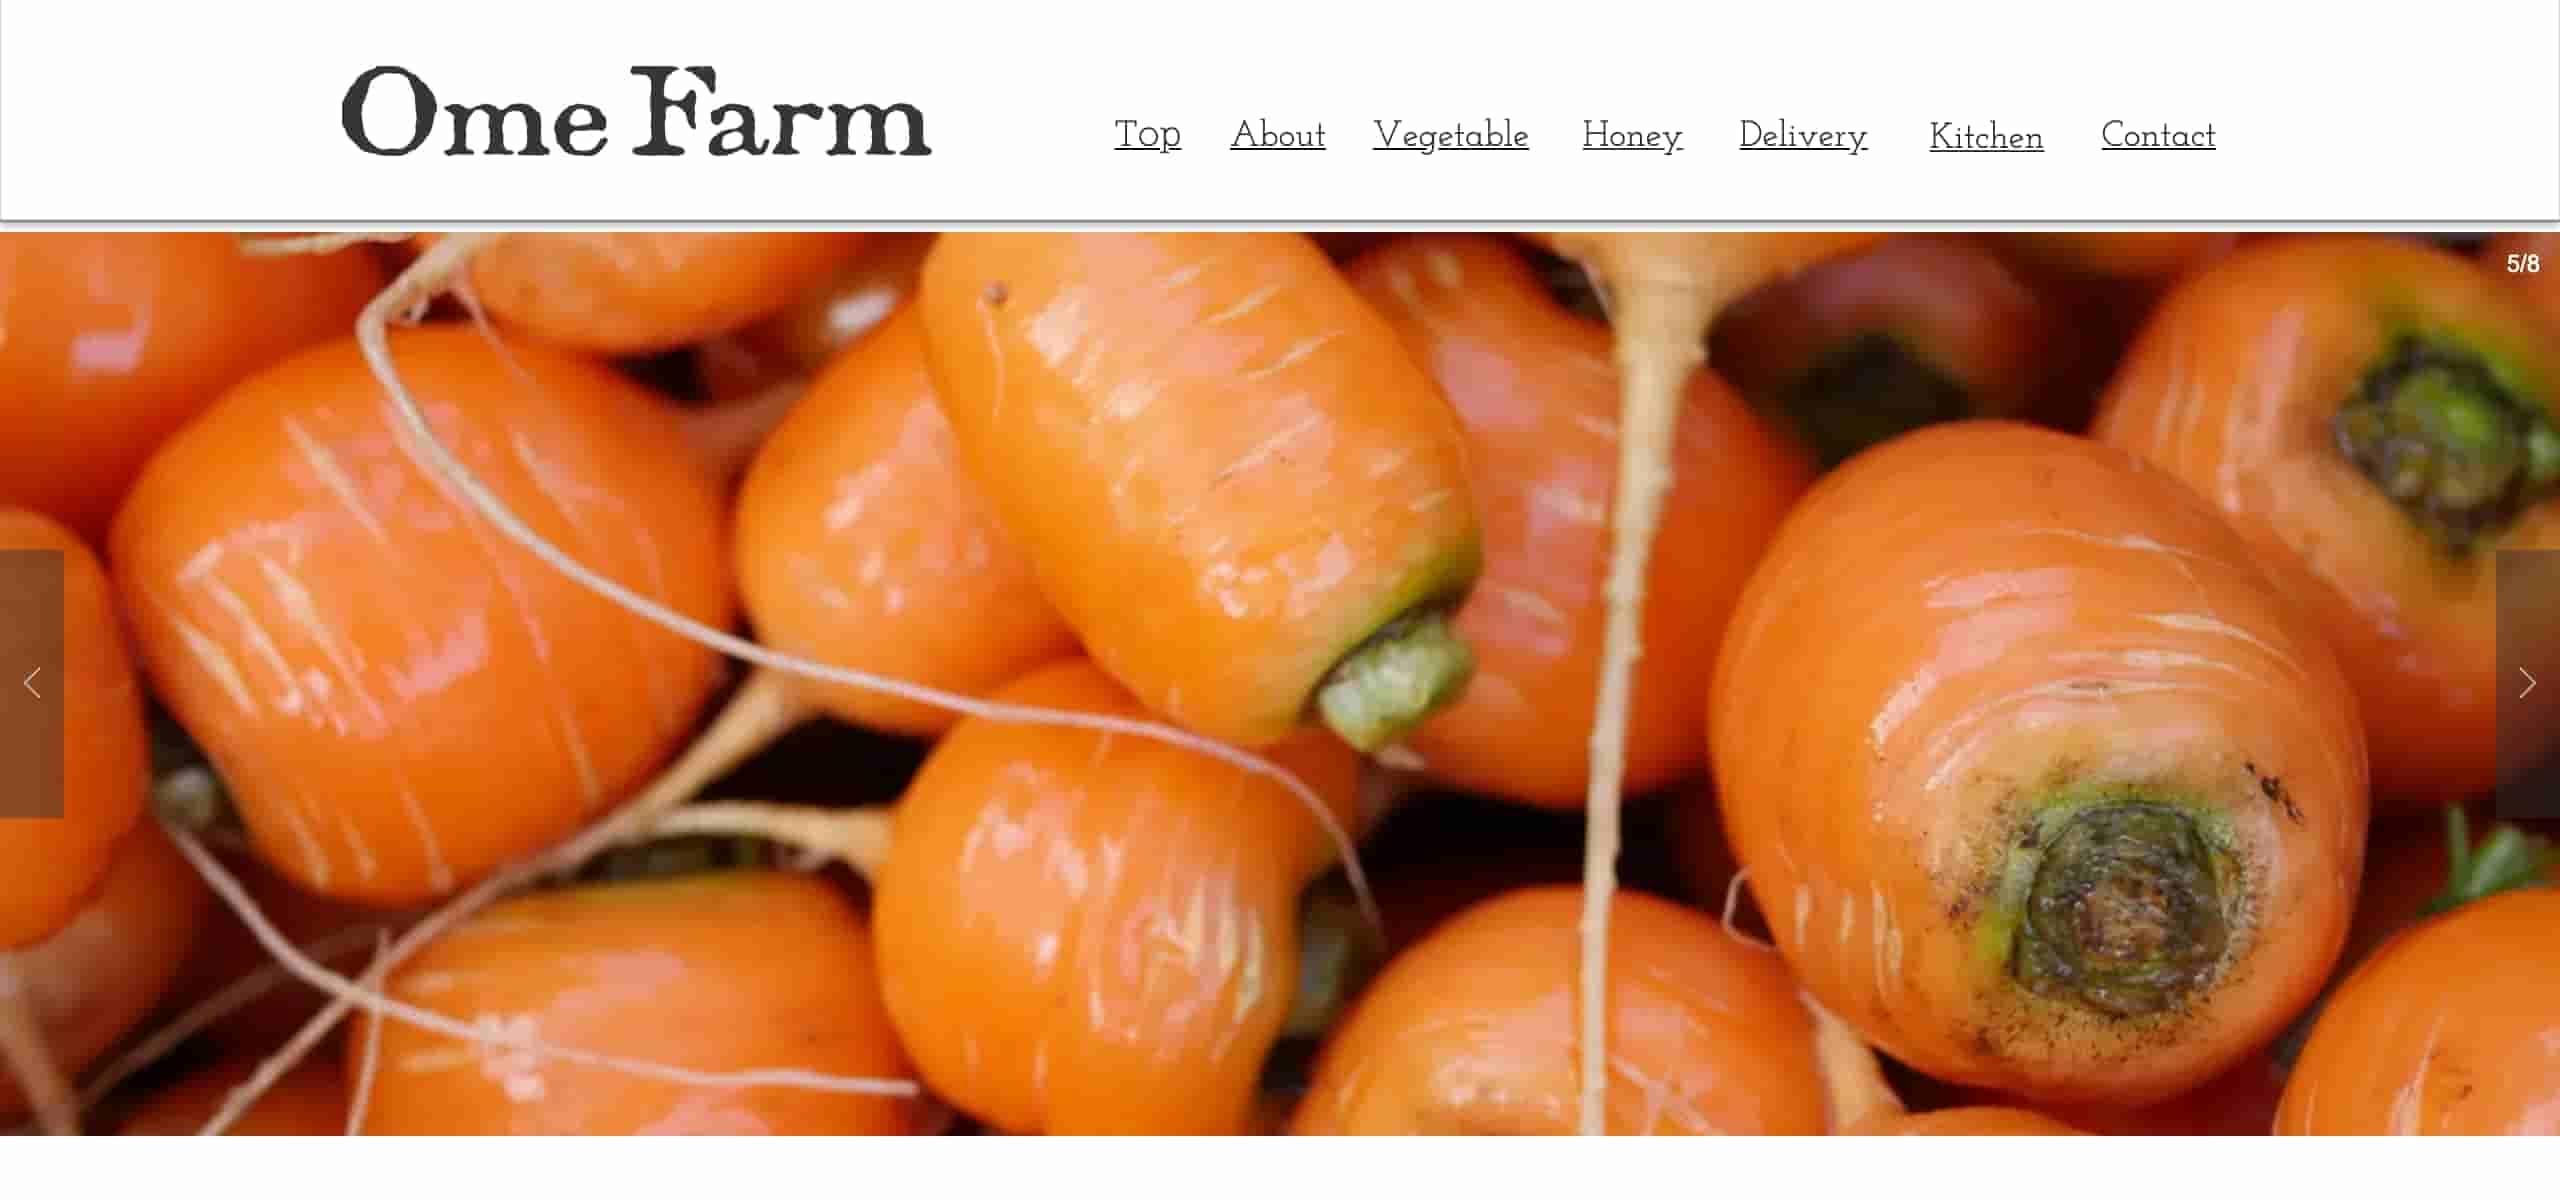 Ome Farm